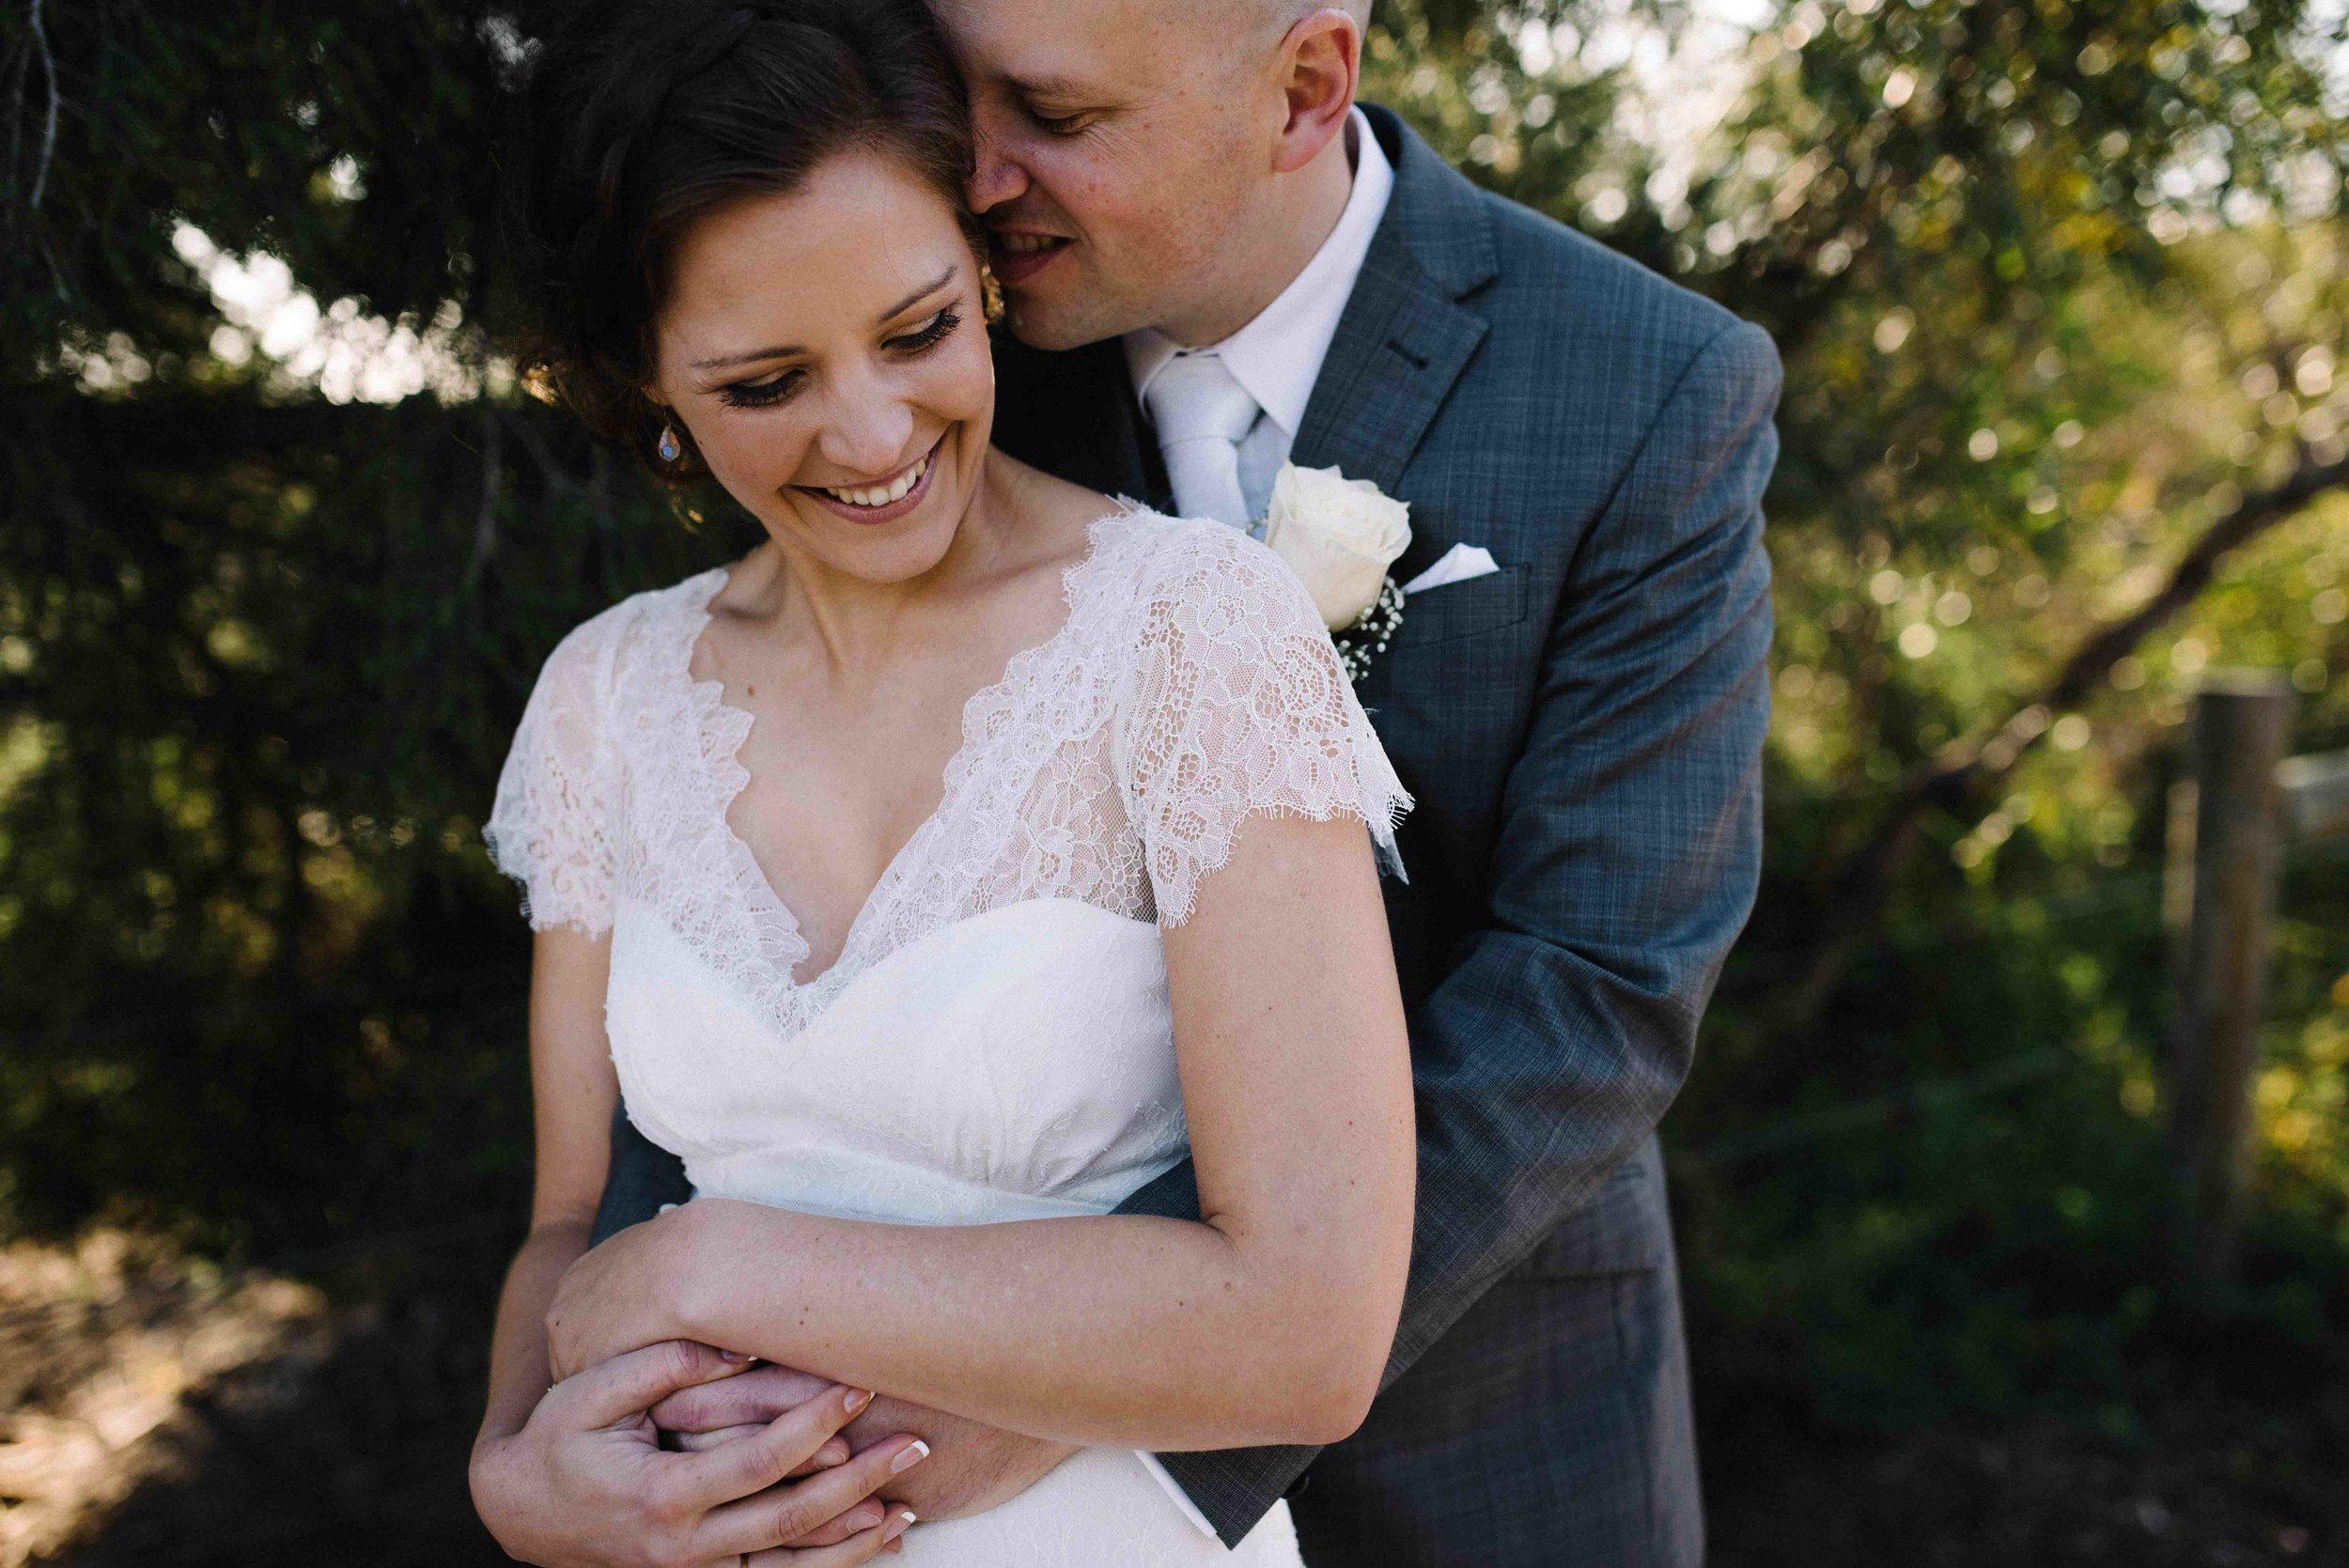 56-lace wedding dress sleeves fremantle perth.jpg